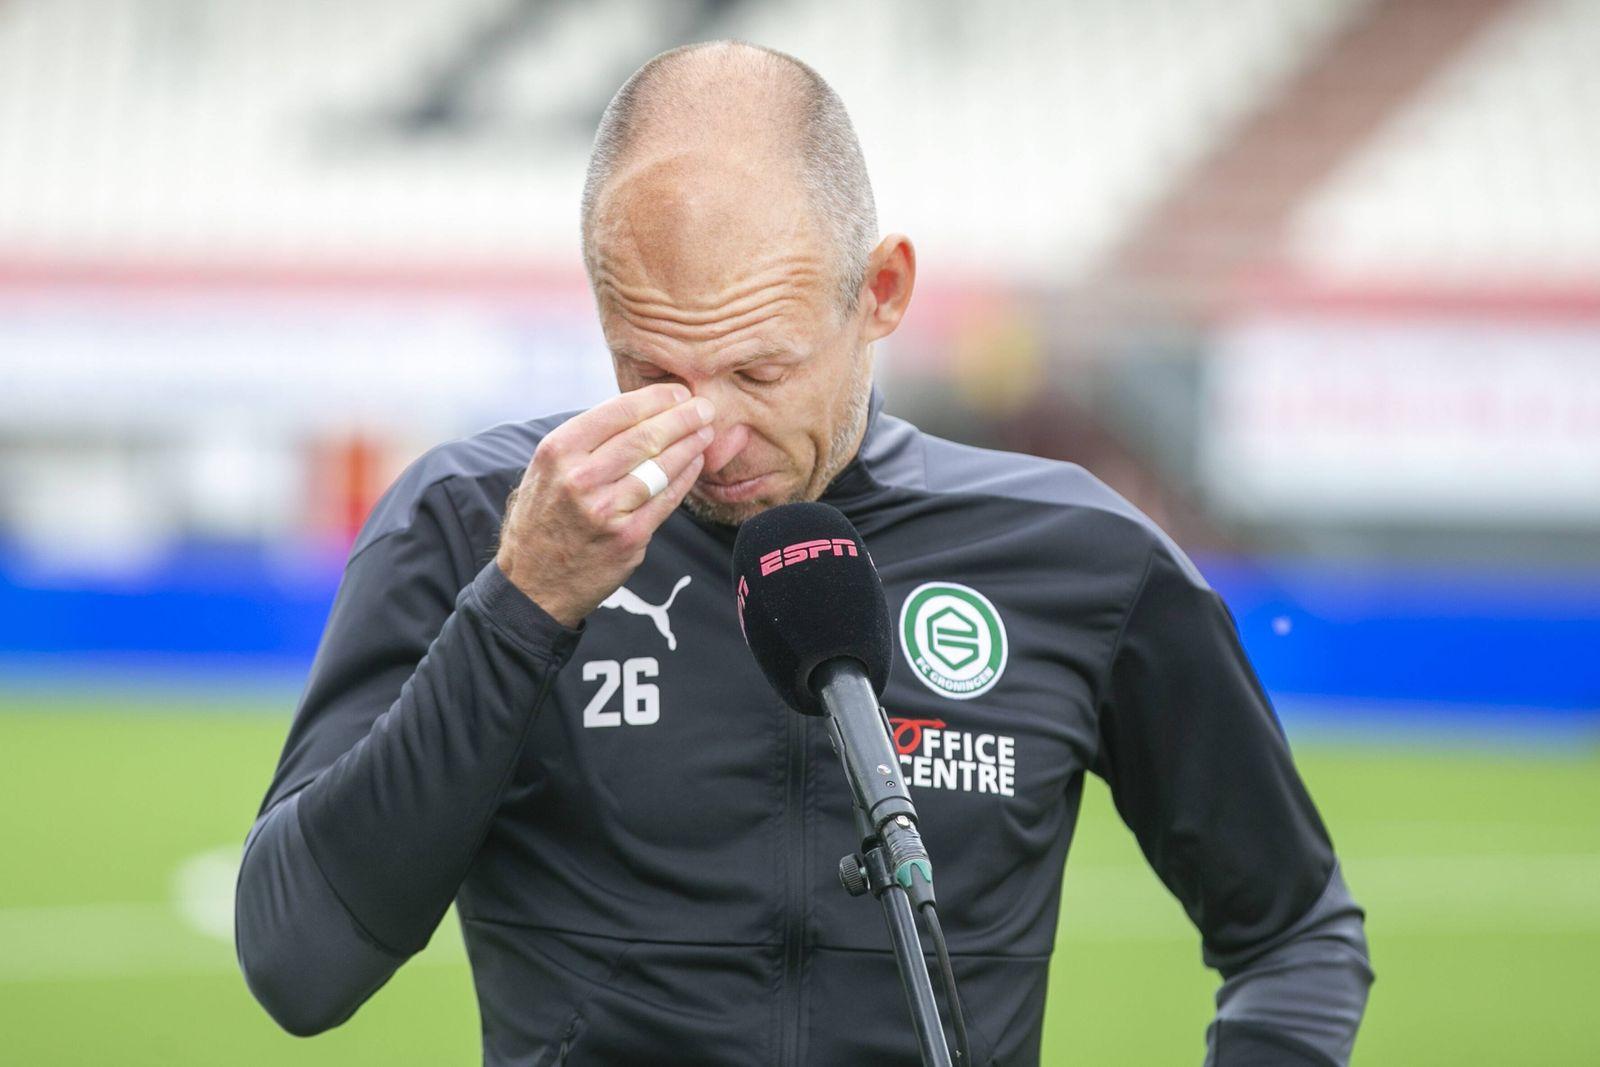 EMMEN, Stadium Oude Meerdijk, 09-05-2021 , season 2020 / 2021 , Dutch Eredivisie. Final result 0-4, FC Groningen player